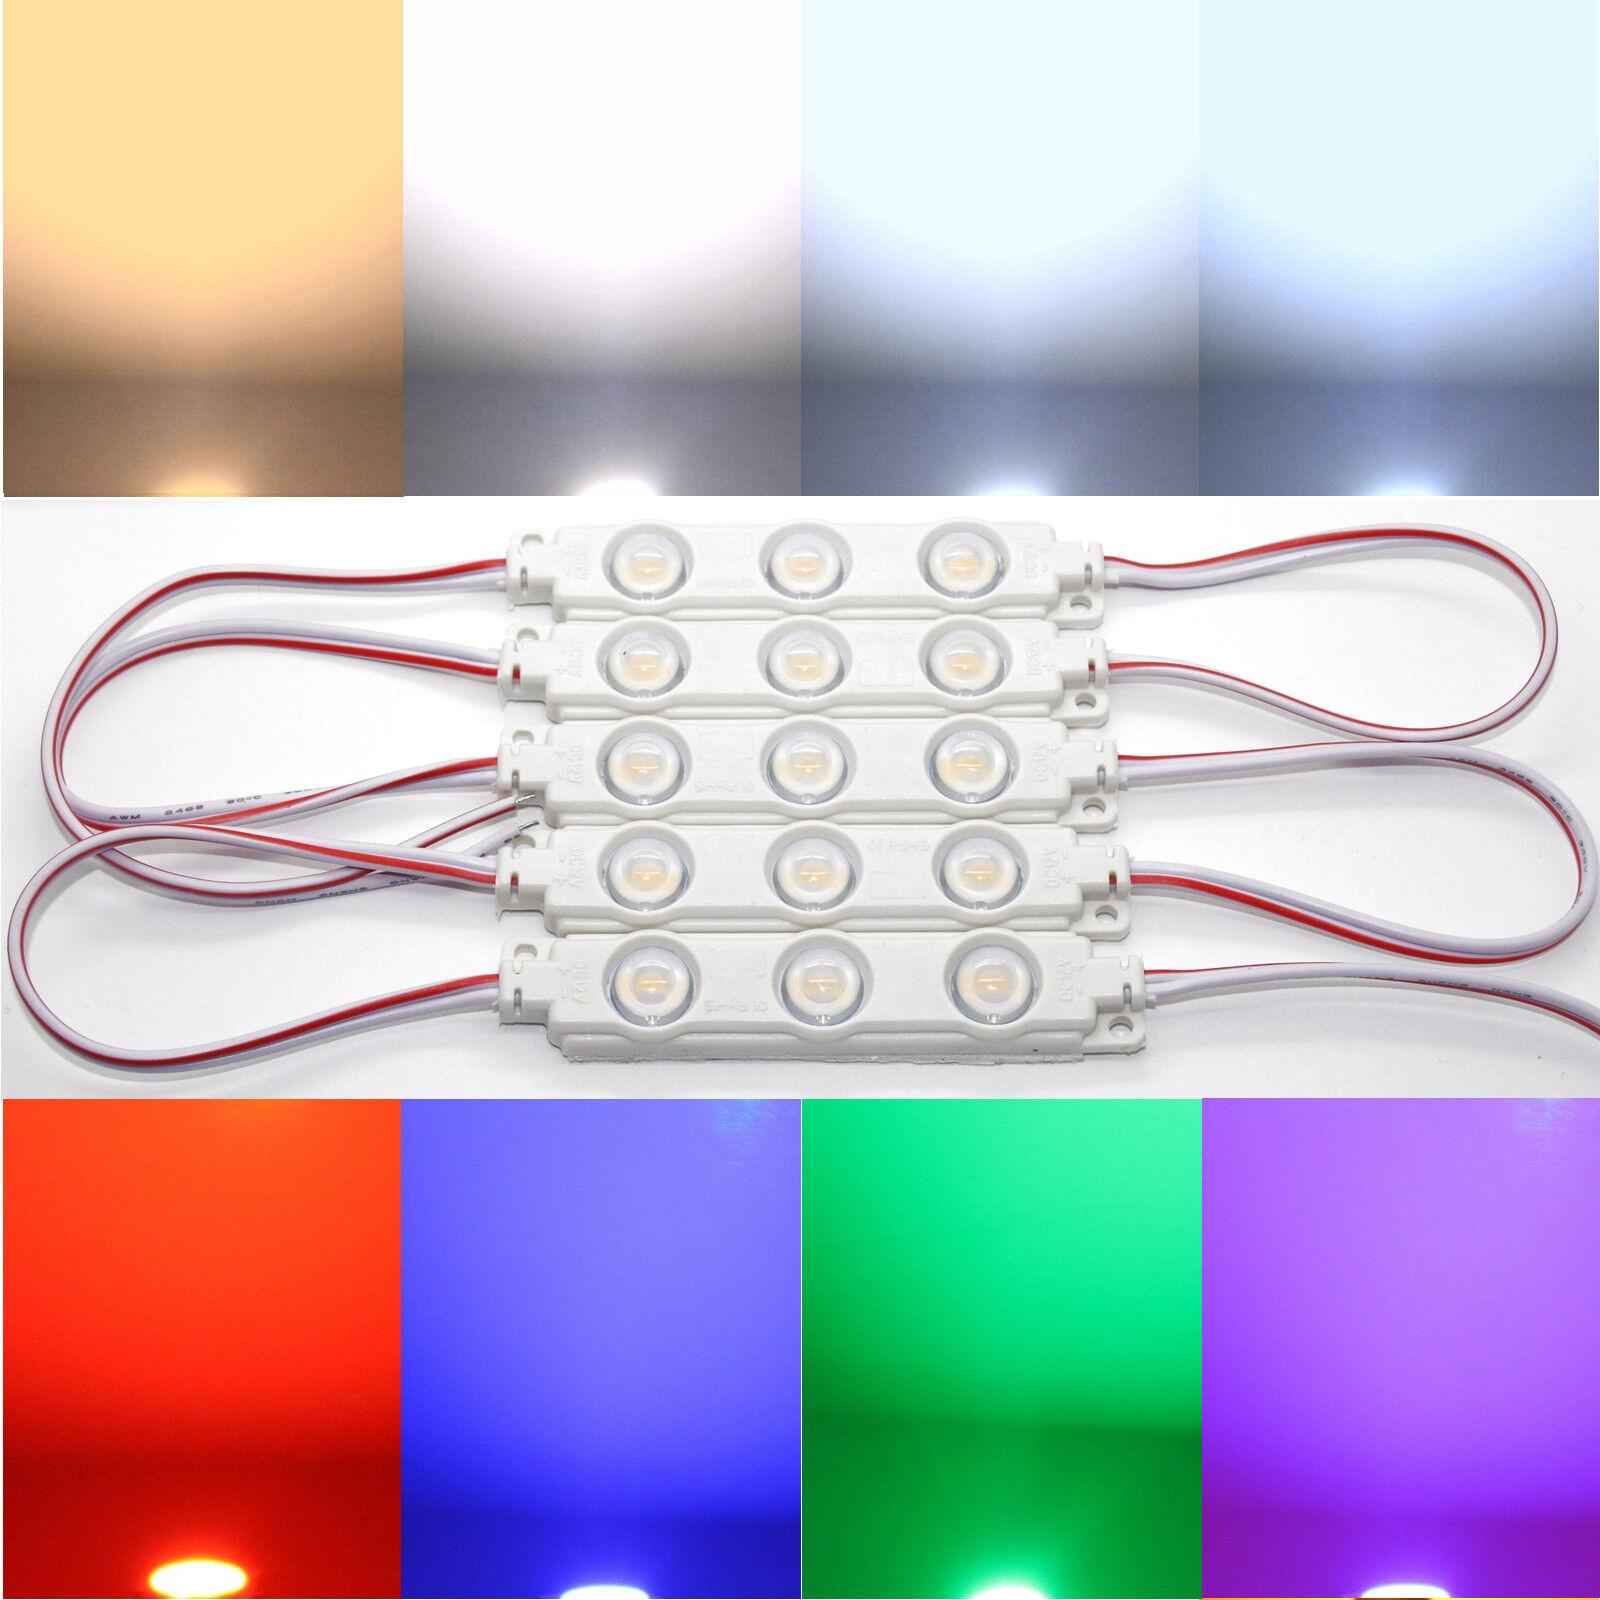 LED Modul 0,5W 12VDC IP67 160° Grad Linse Werbetechnik Leuchtbuchstaben Tikor 1